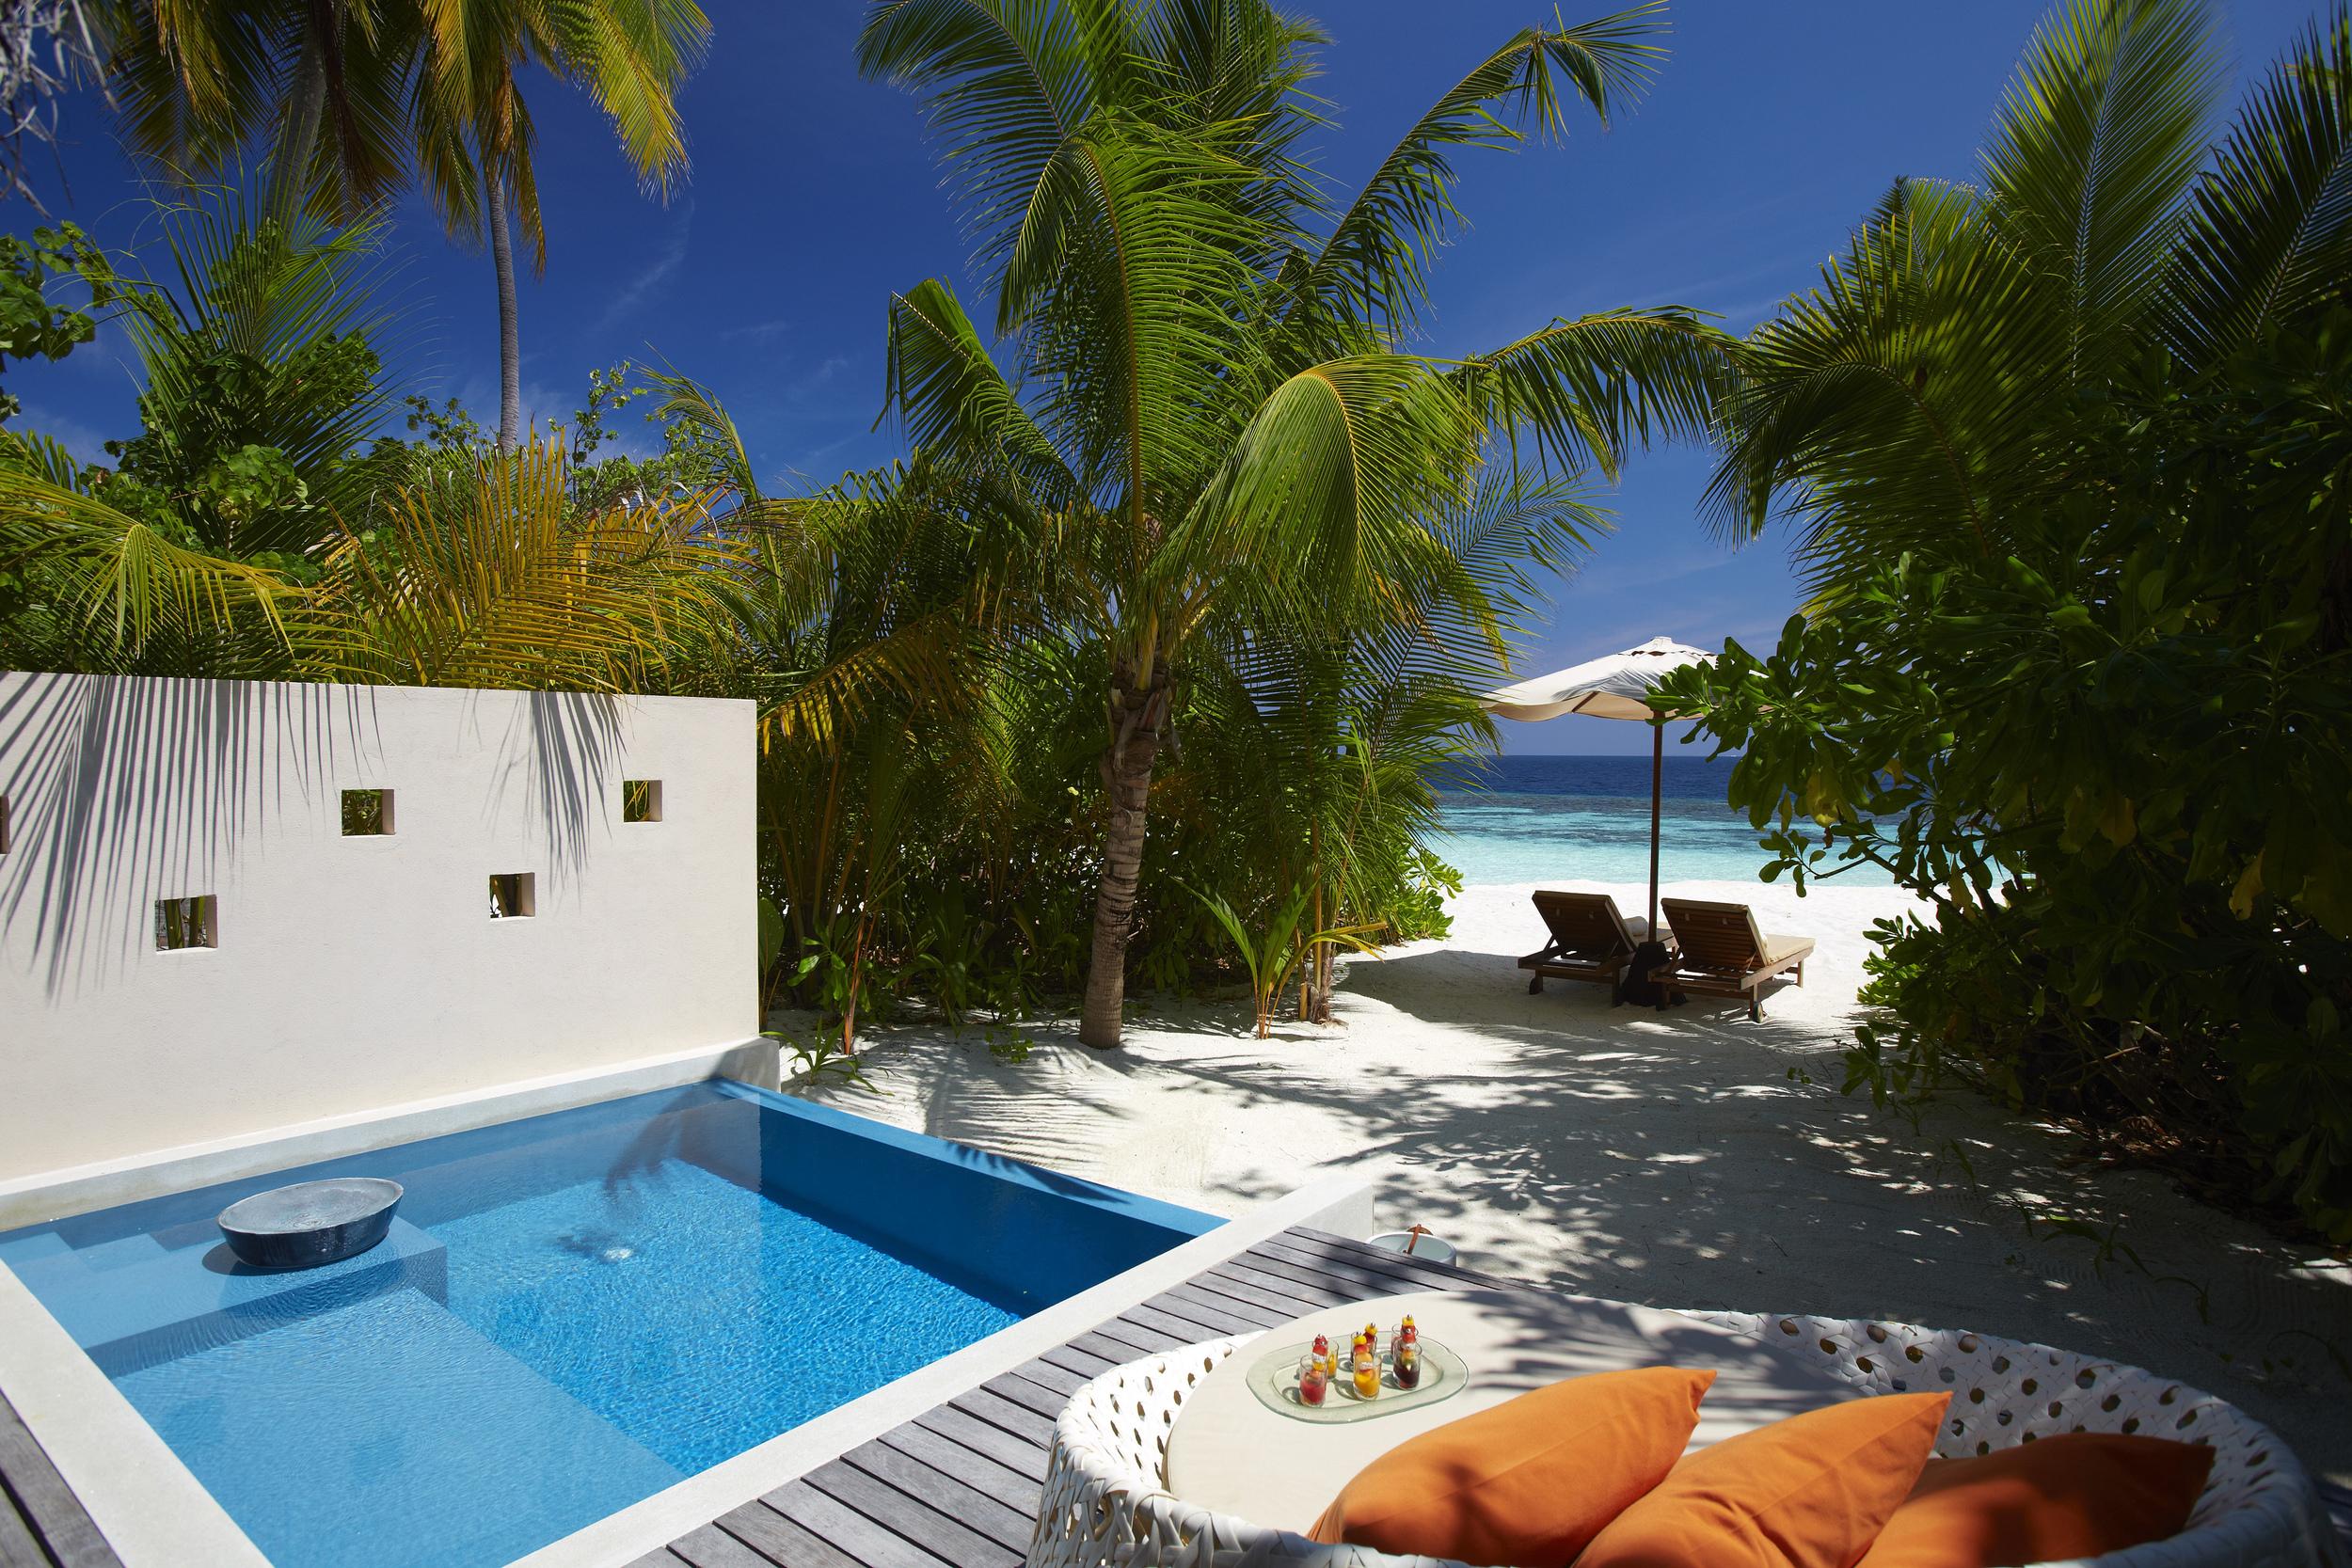 Hi_PHUV_59890053_Deluxe_Beach_Bungalow_With_Pool_Exterior.jpg